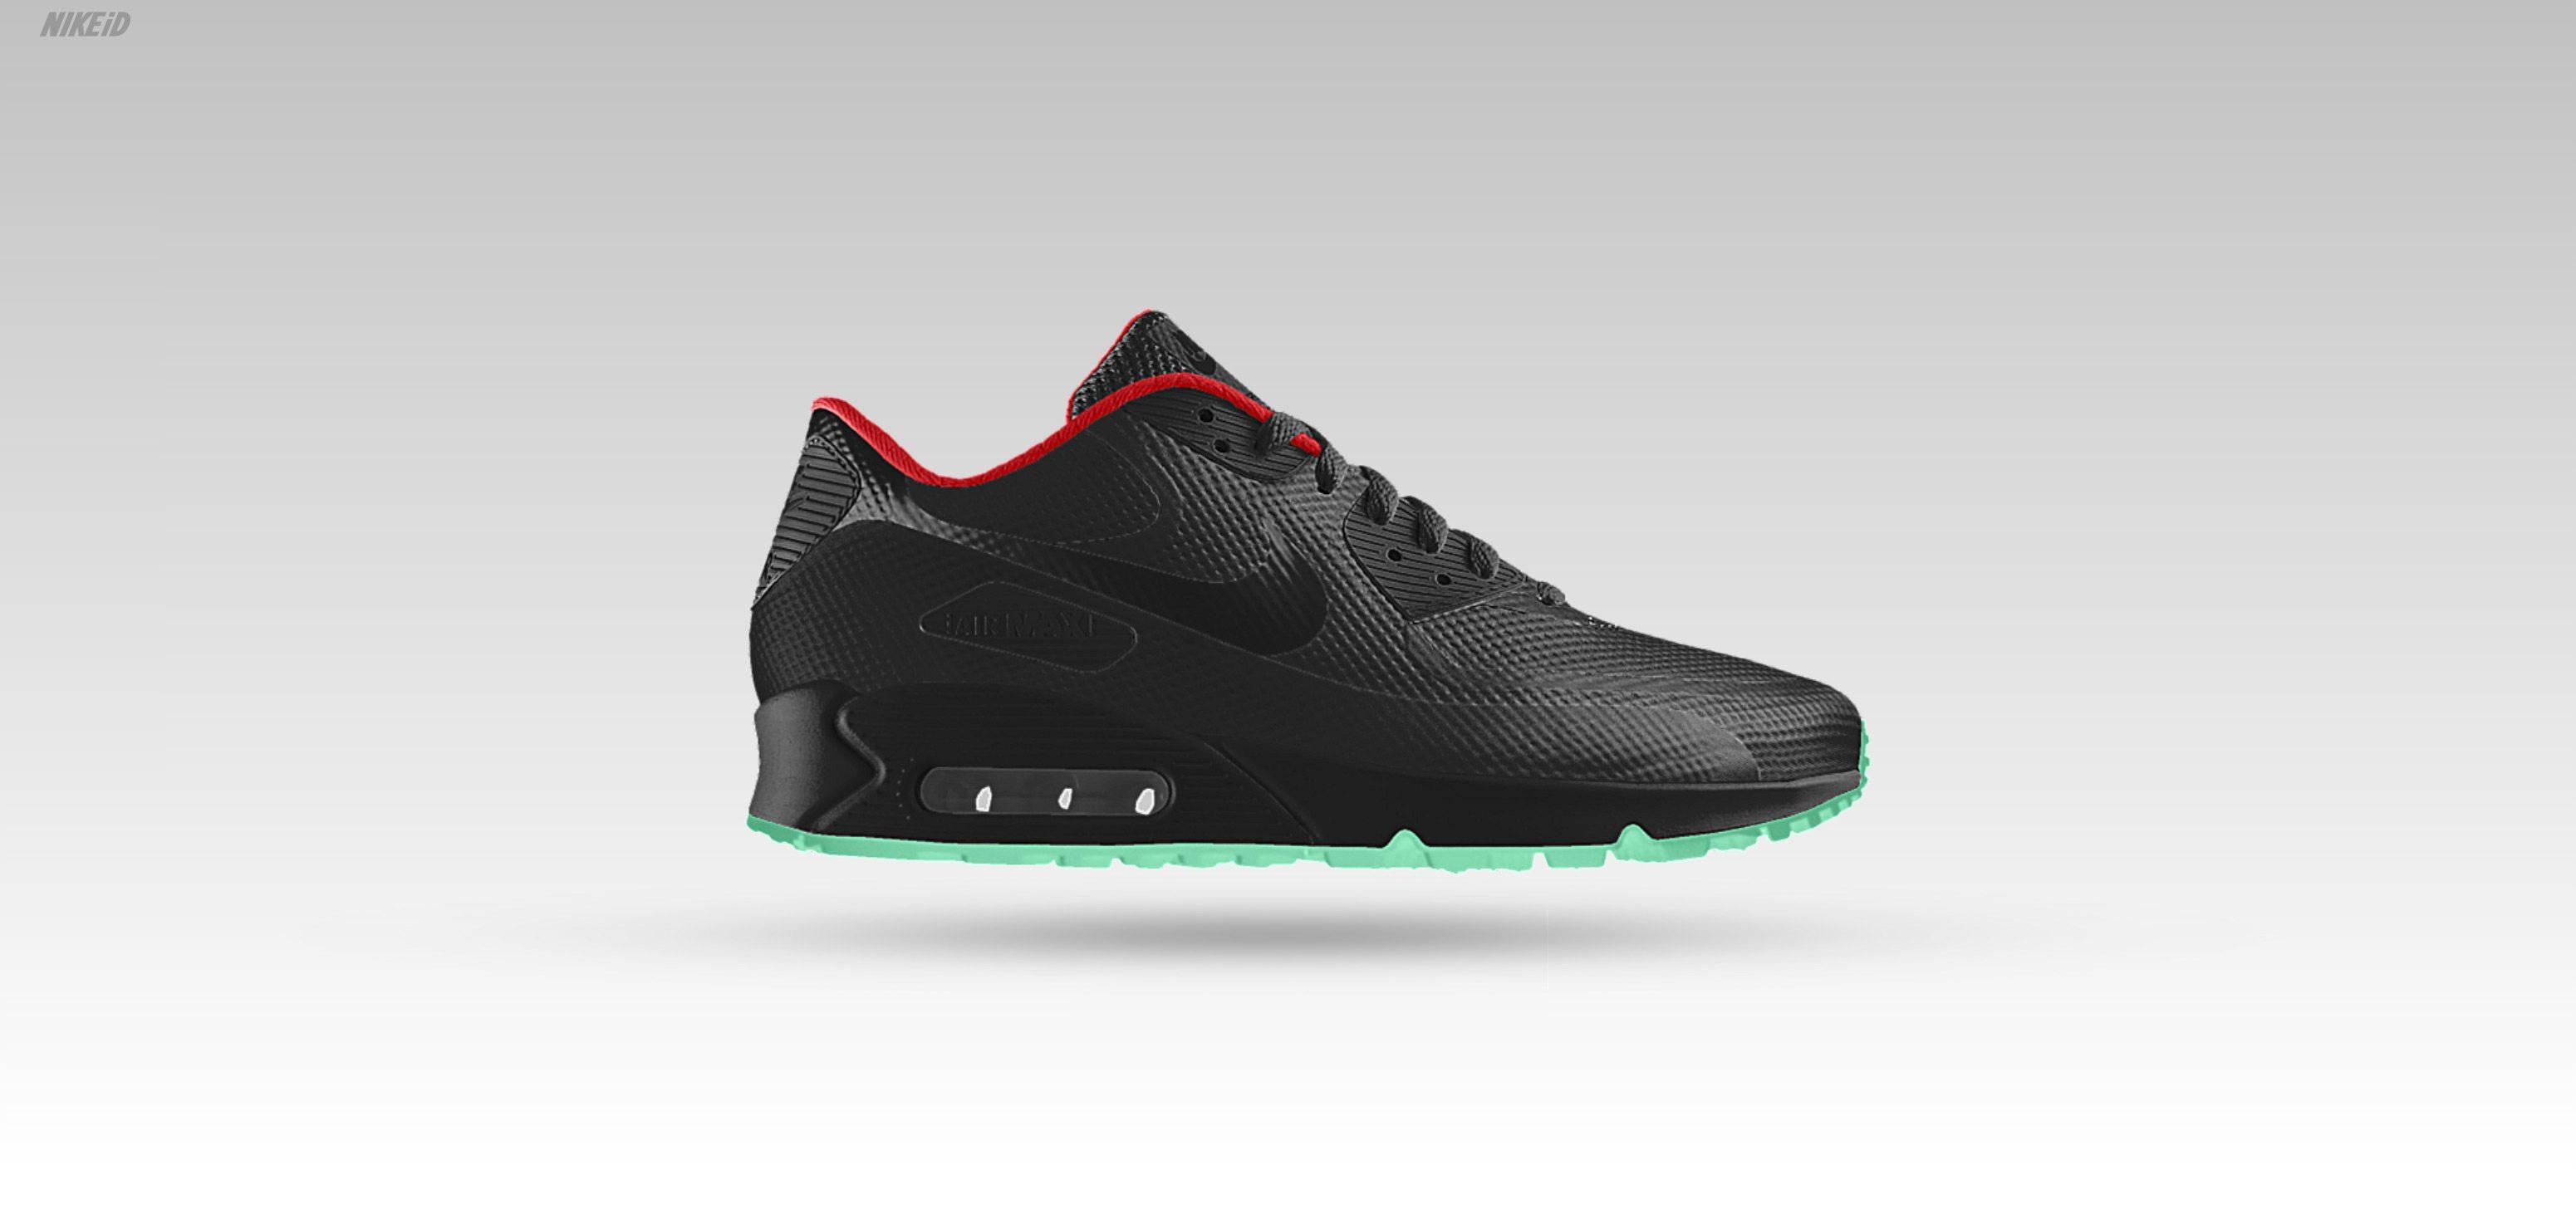 Nike Air Max 90 Hyperfuse iD Black Solar